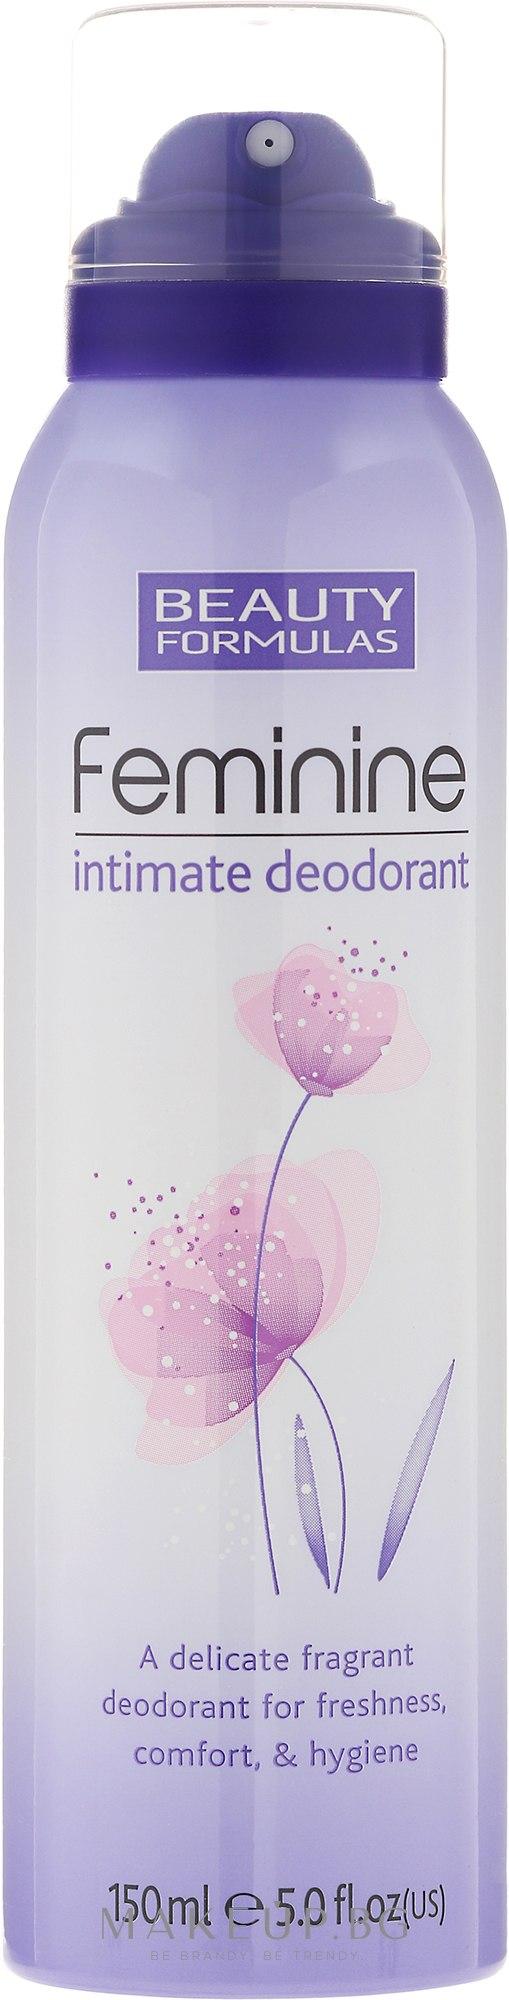 Дезодорант за интимна хигиена - Beauty Formulas Feminine Intimate Deodorant — снимка 150 ml